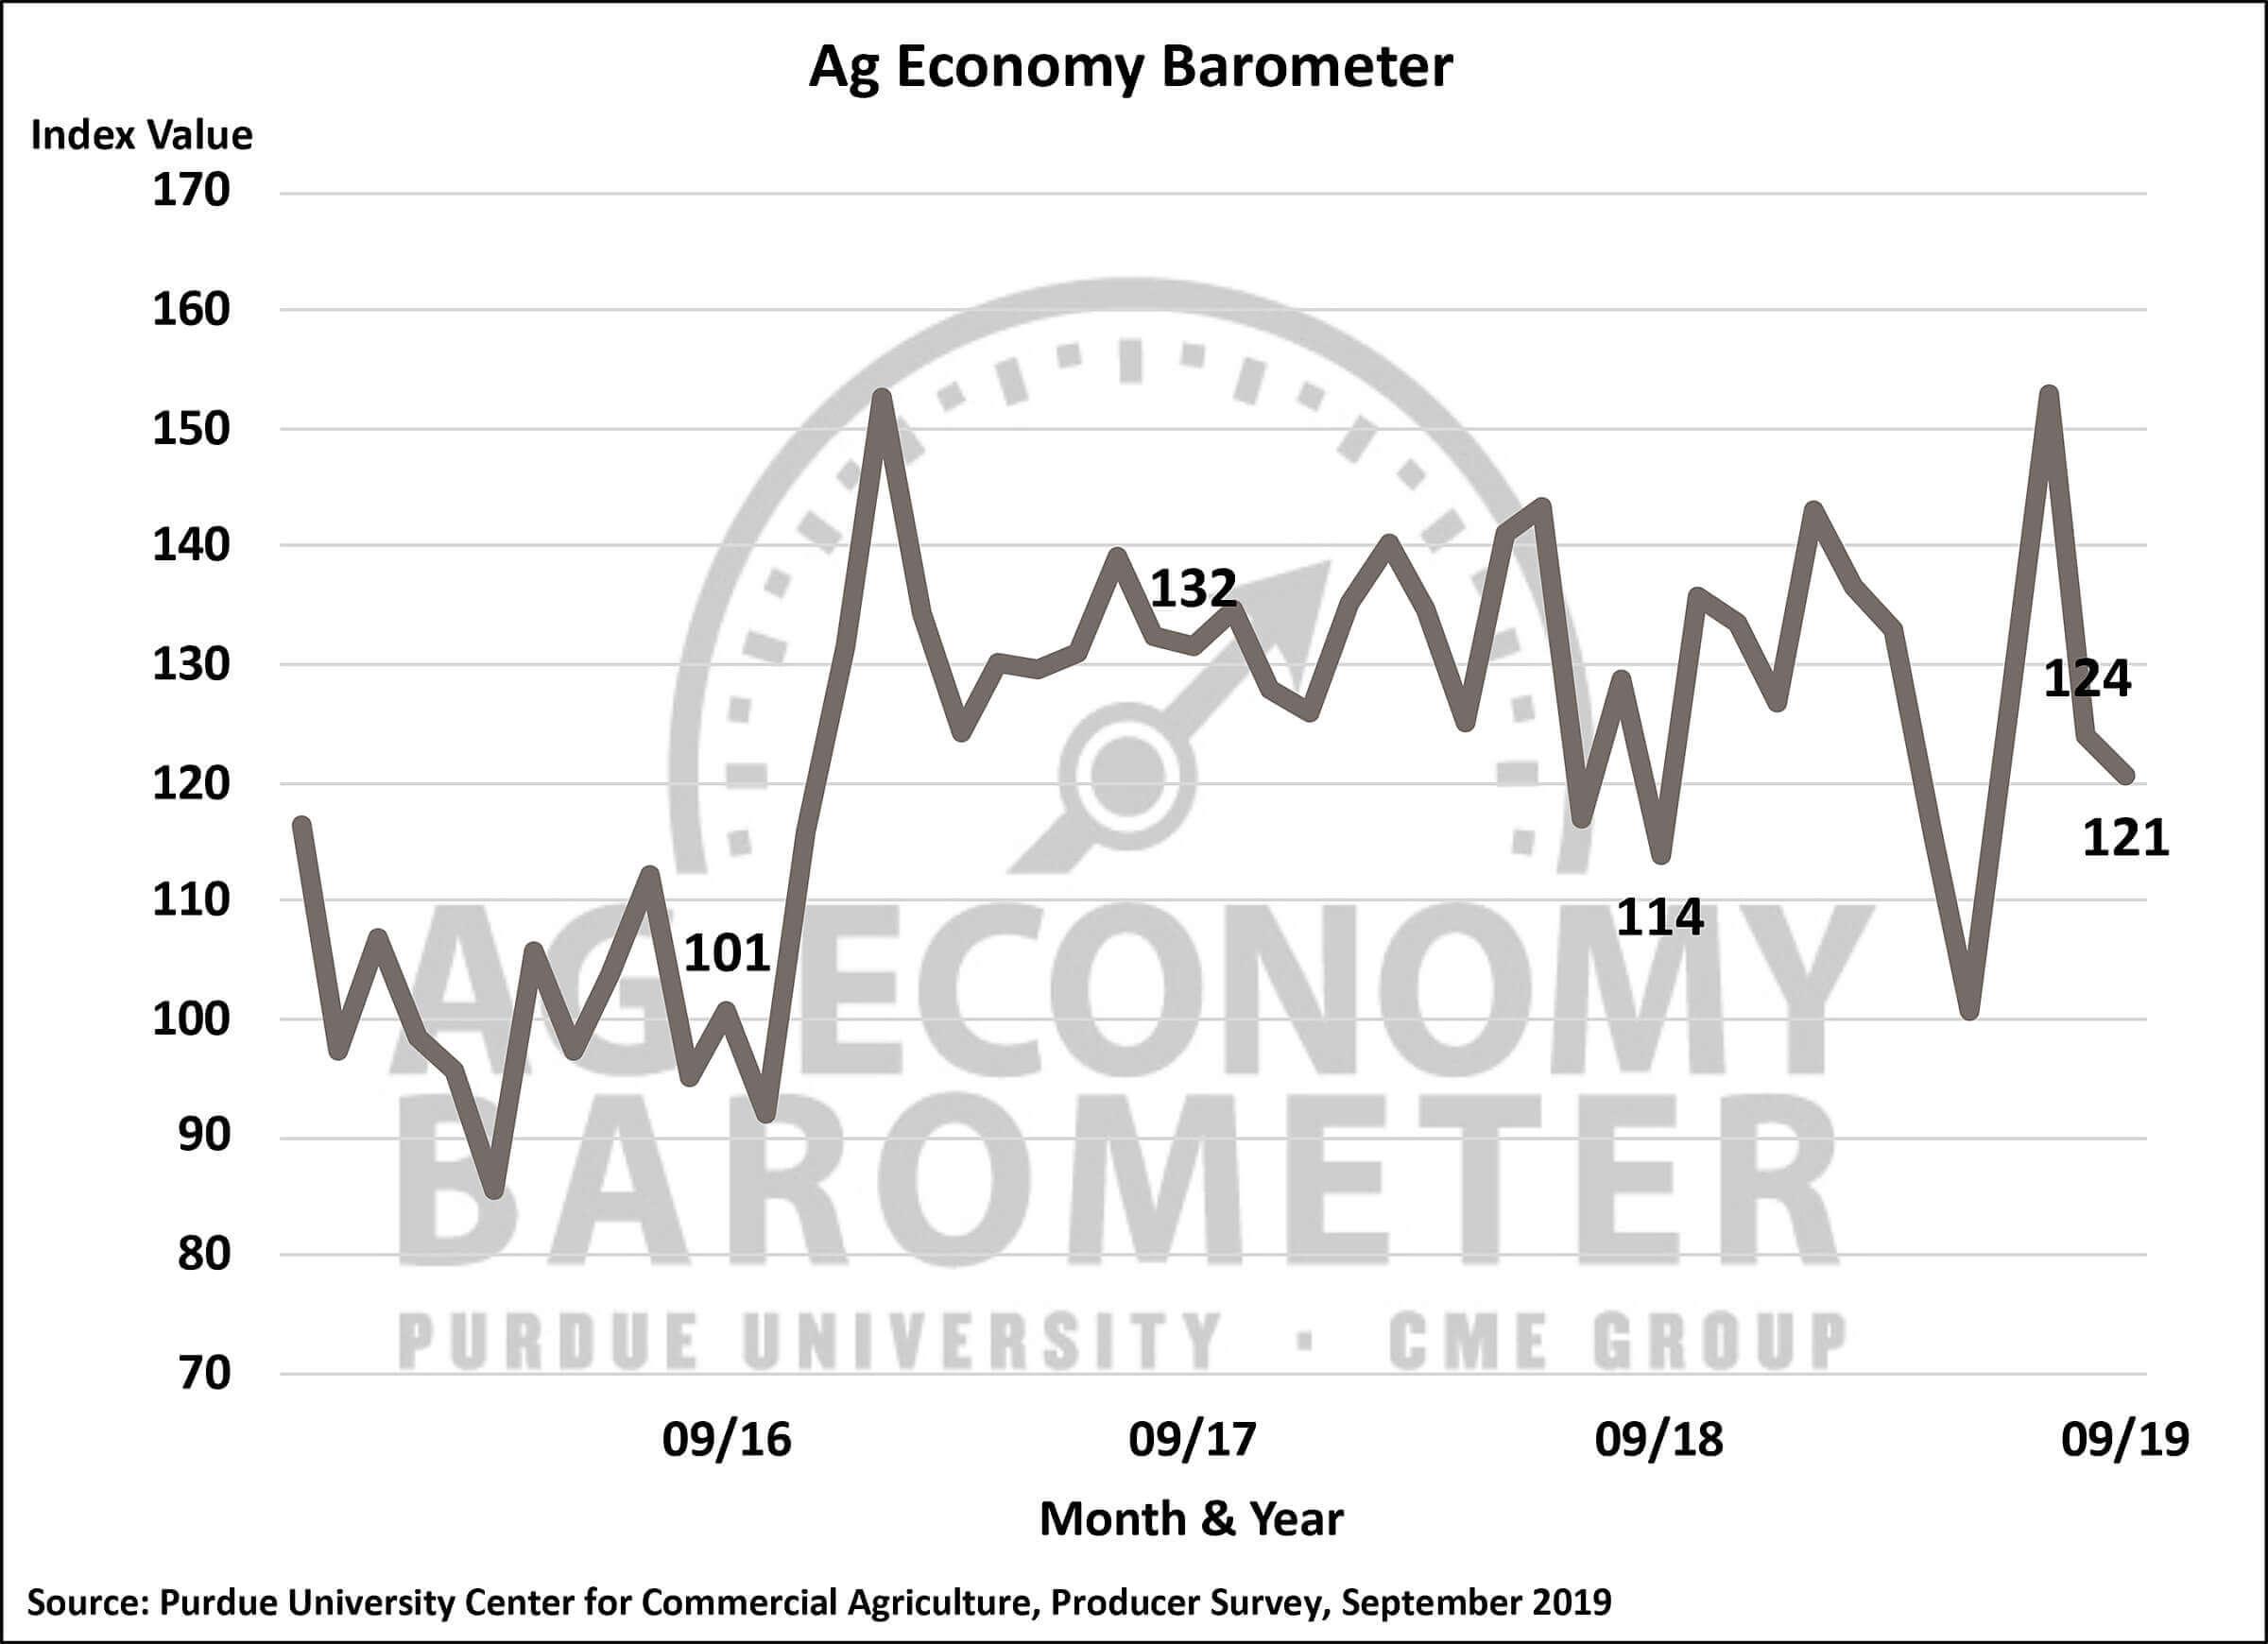 Farmer sentiment regarding current conditions slips in